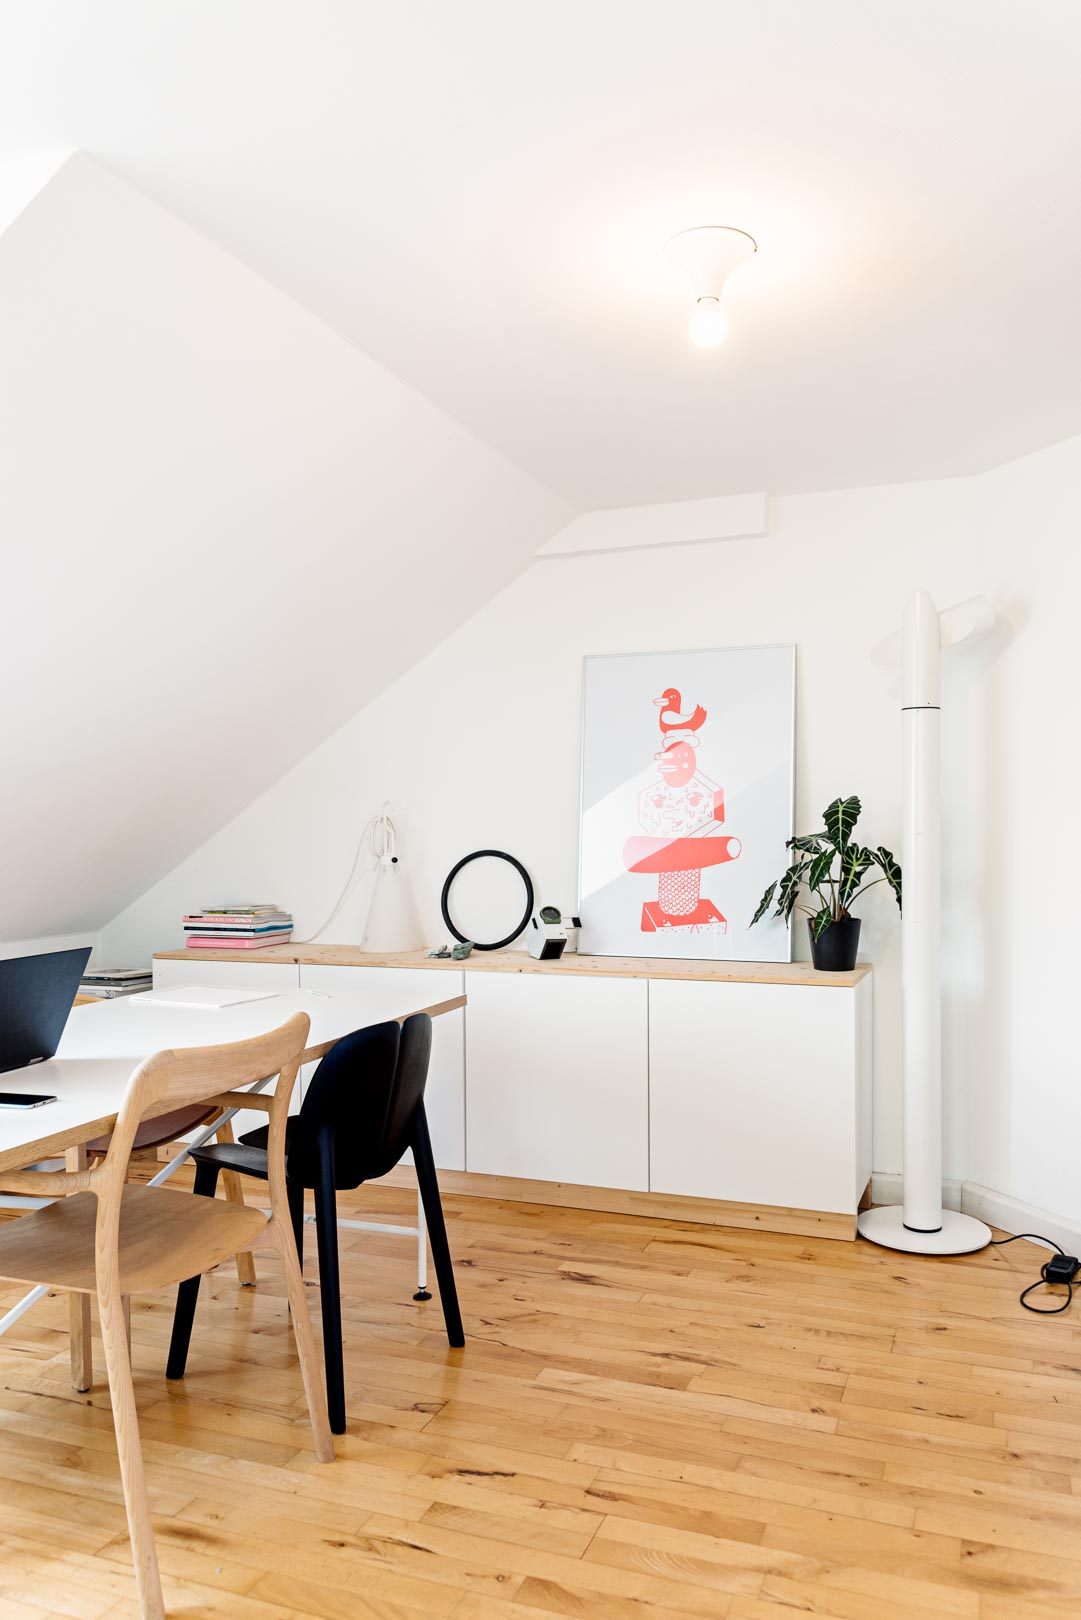 Design Extra - Relvaokellermann